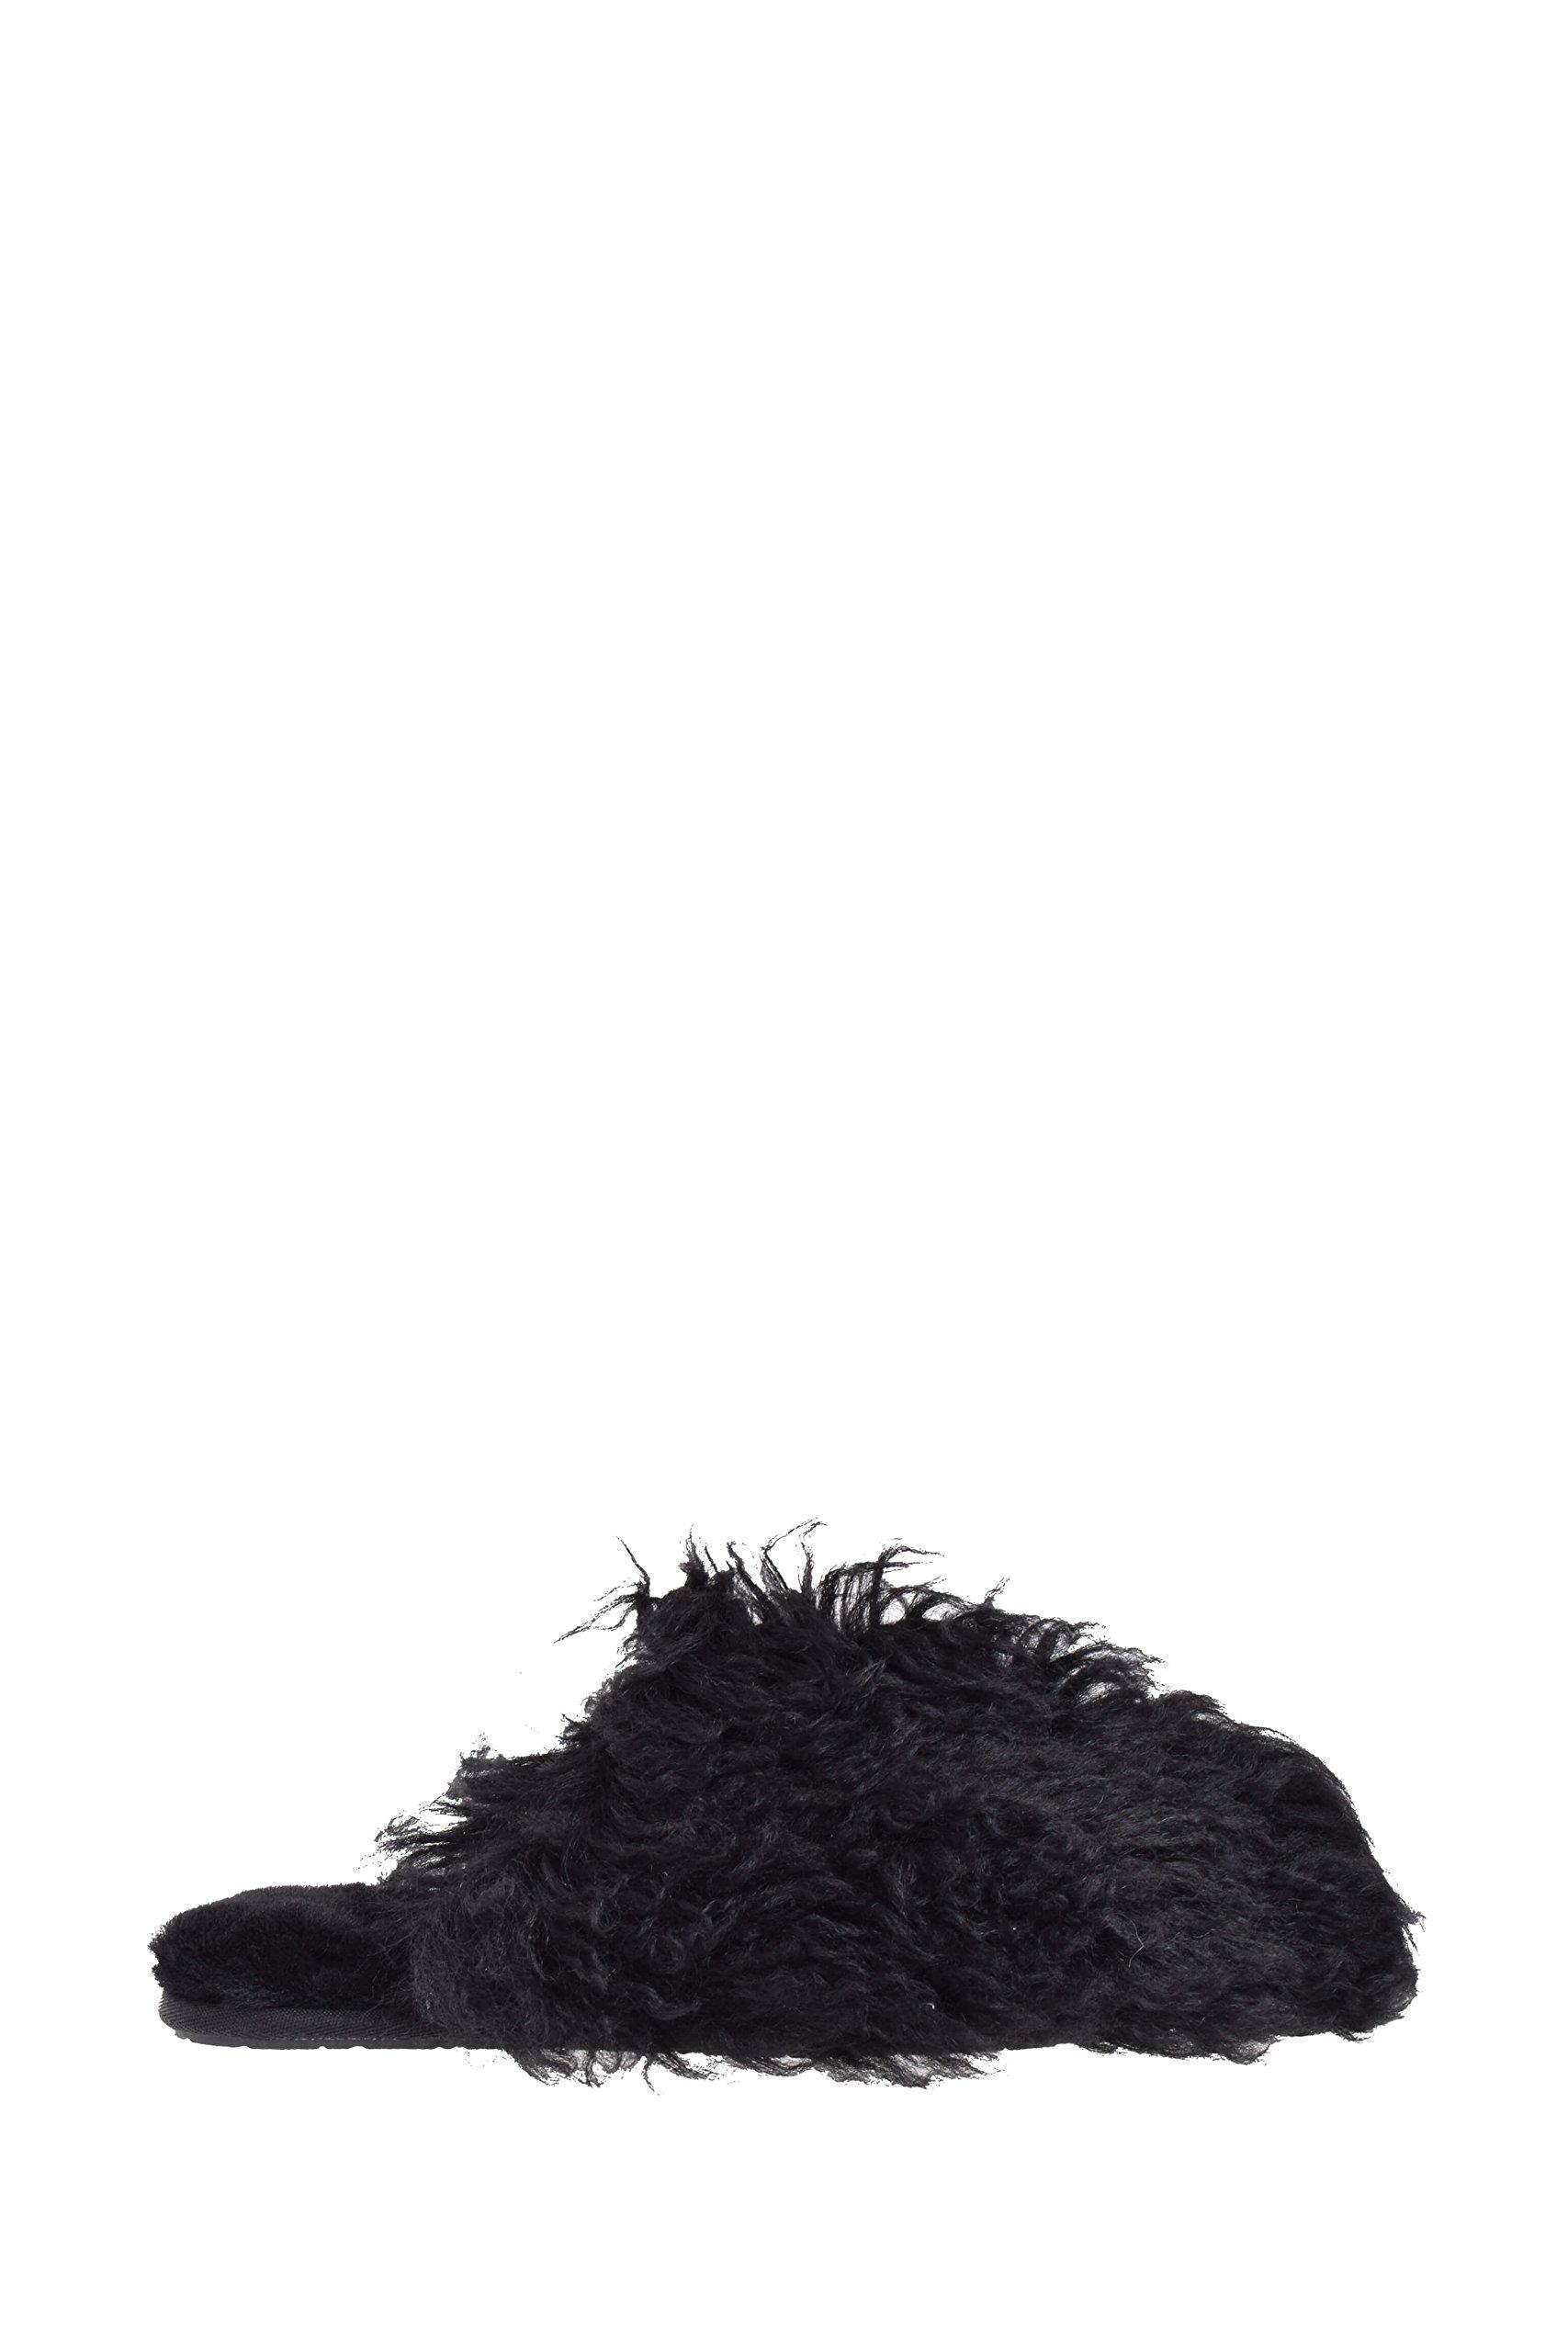 UGG Womens Fluff Momma Mongolian Clog Black Size 7